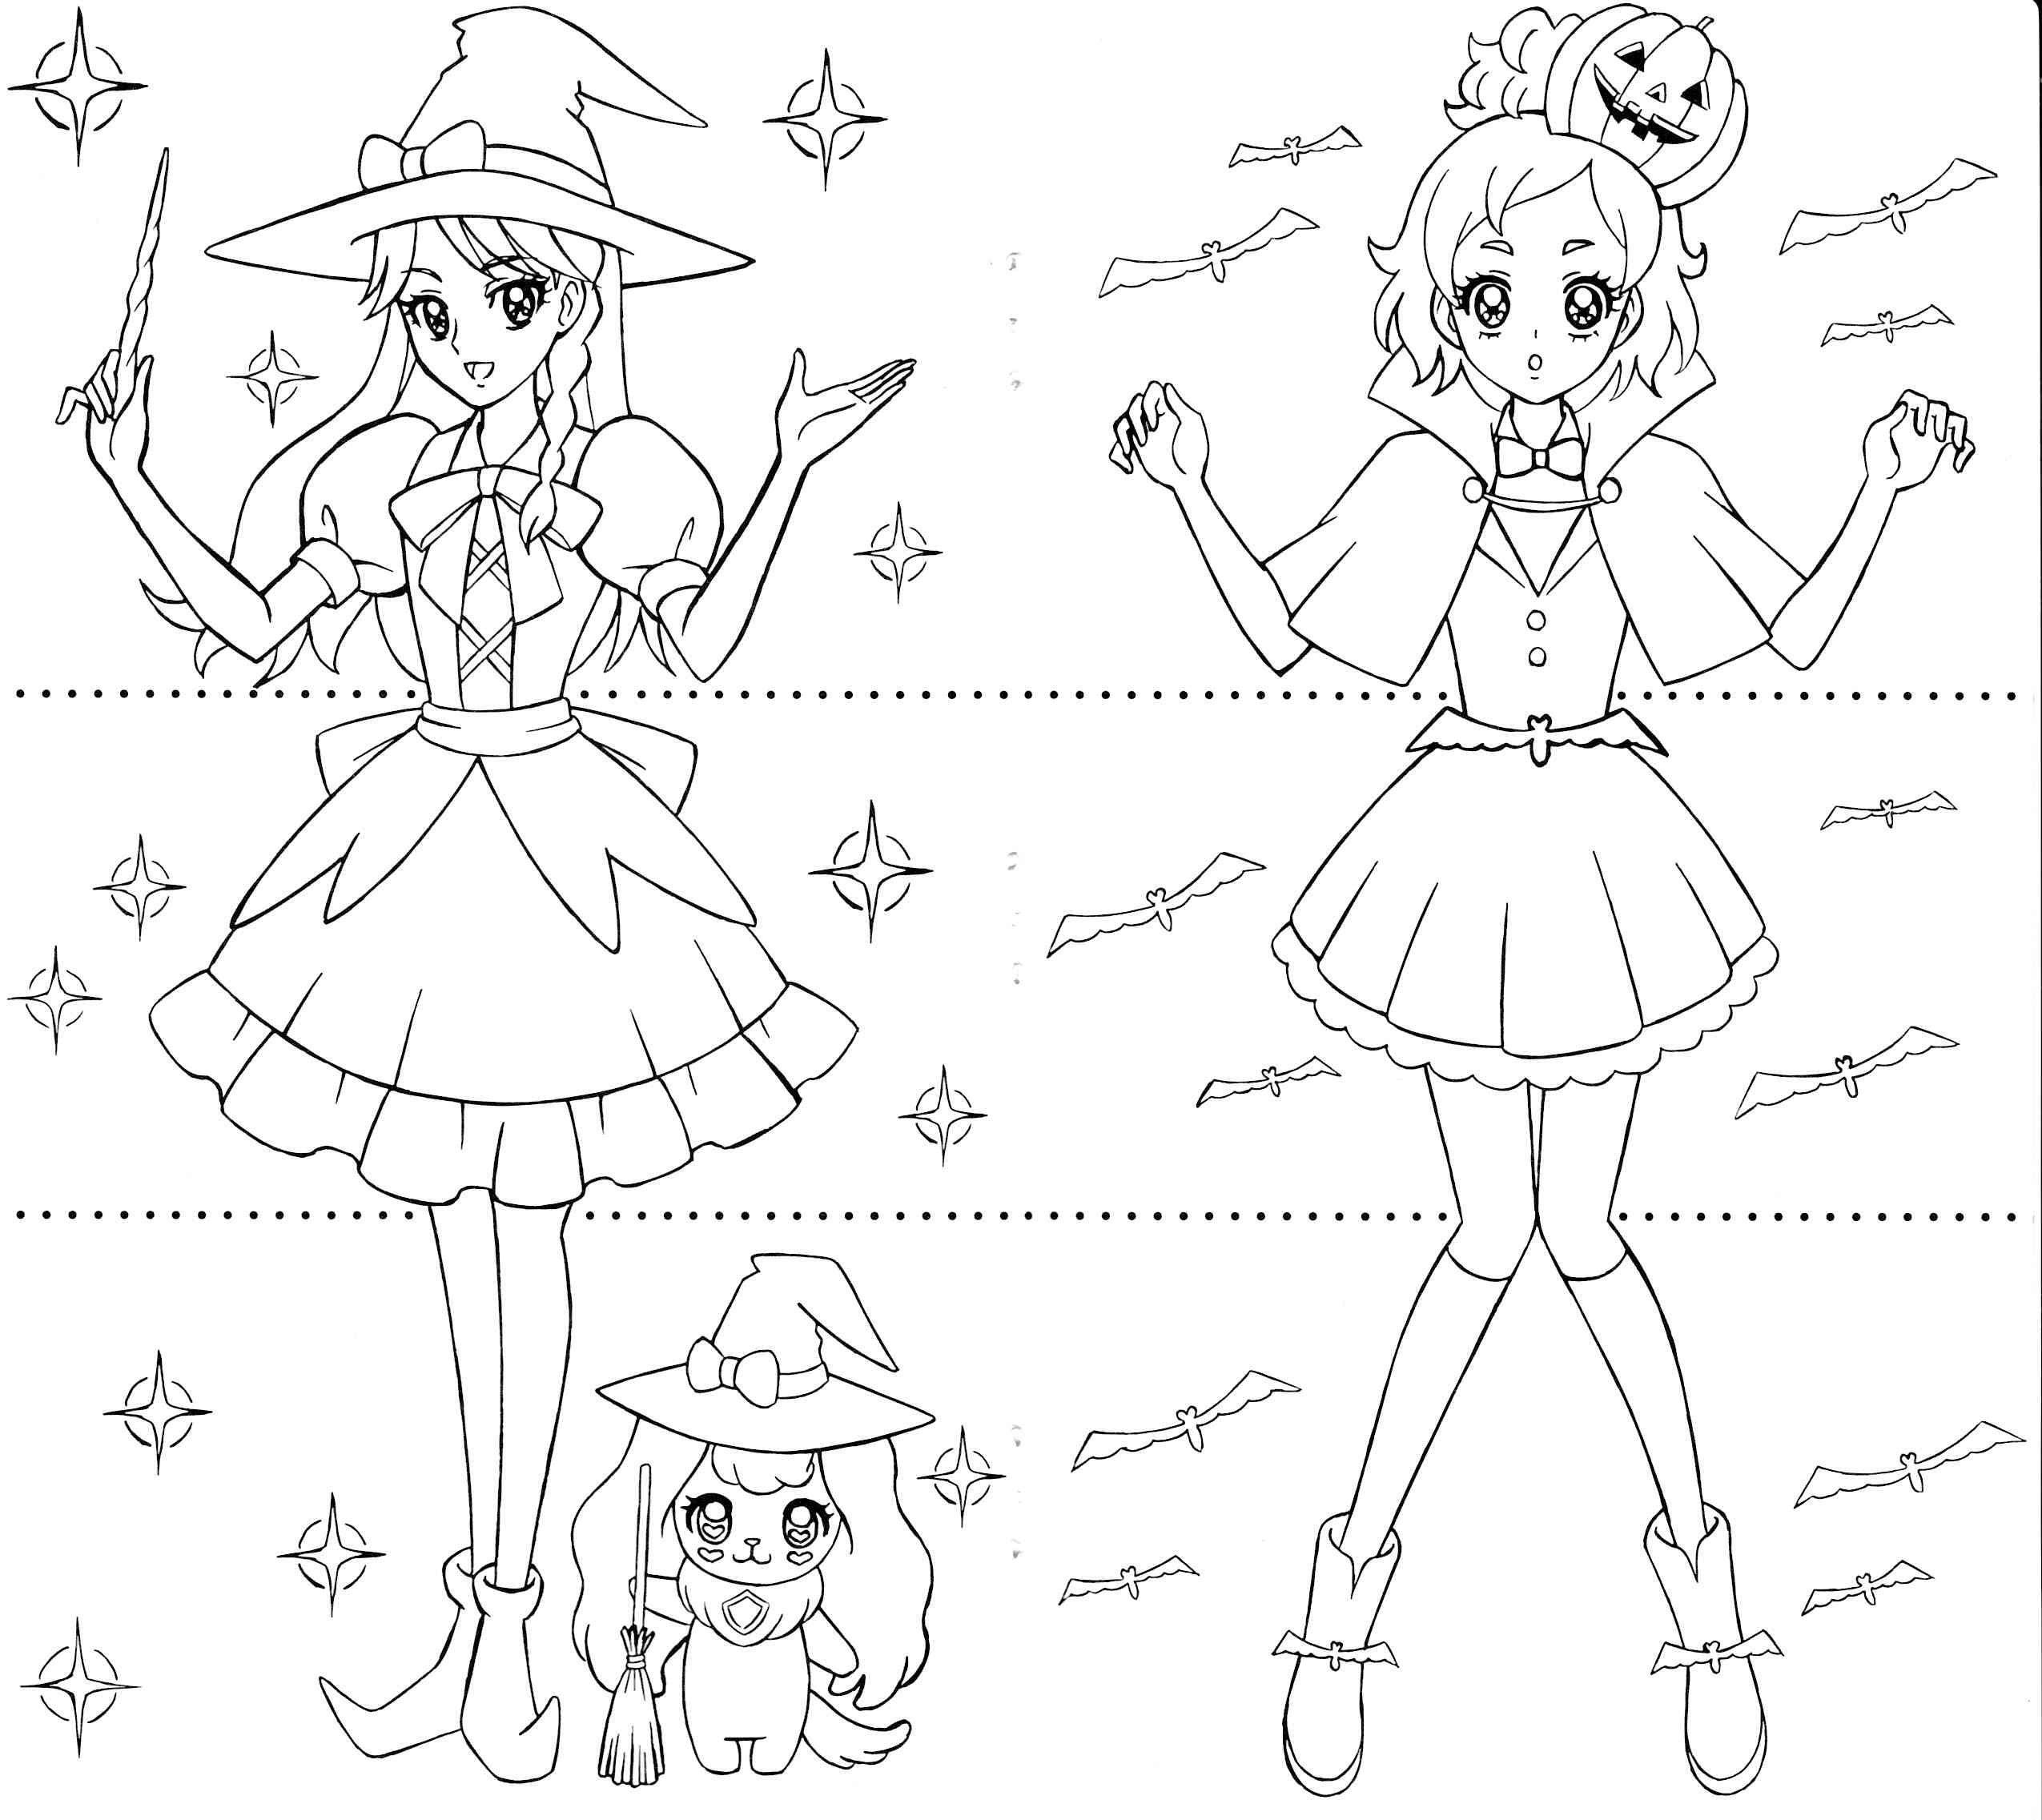 princess precure | minami&haruka | Anime coloring pages! | Pinterest ...